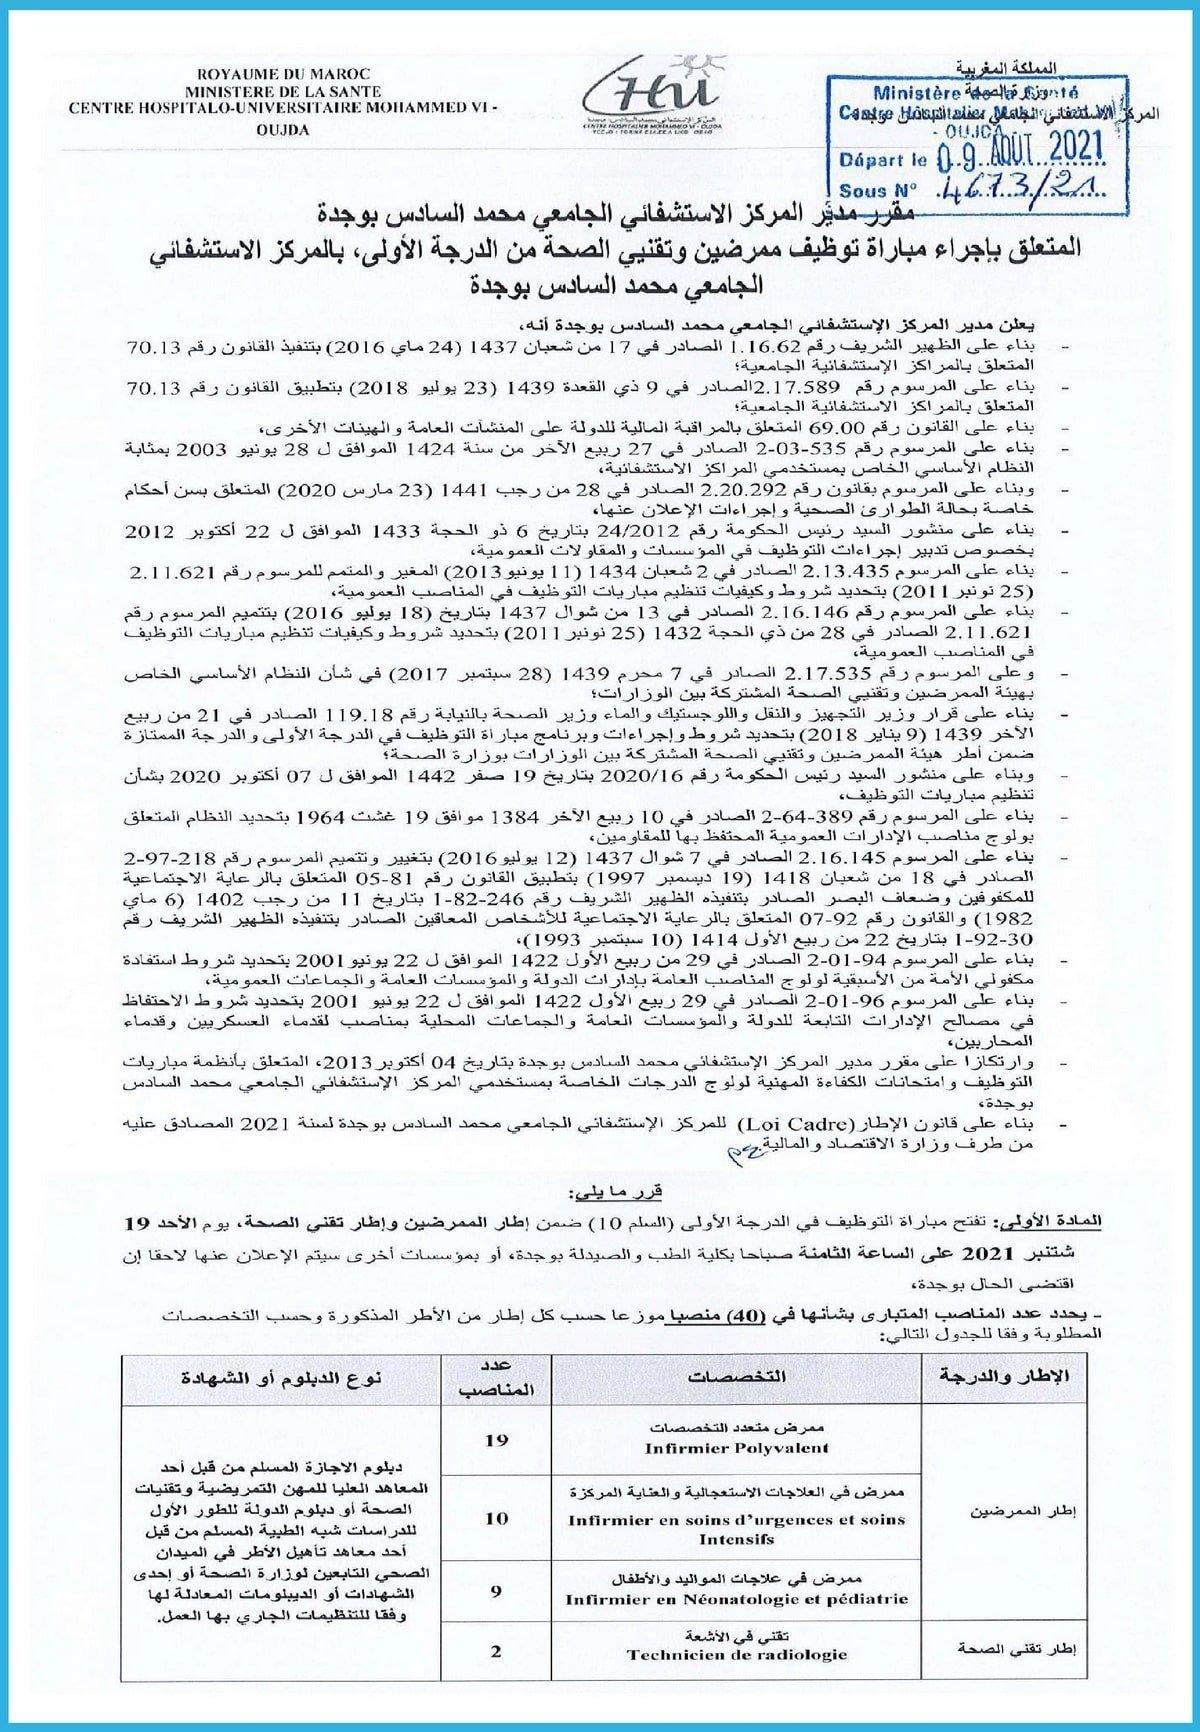 chu m610 Concours CHU Mohammed VI Oujda 2021 (40 Postes)